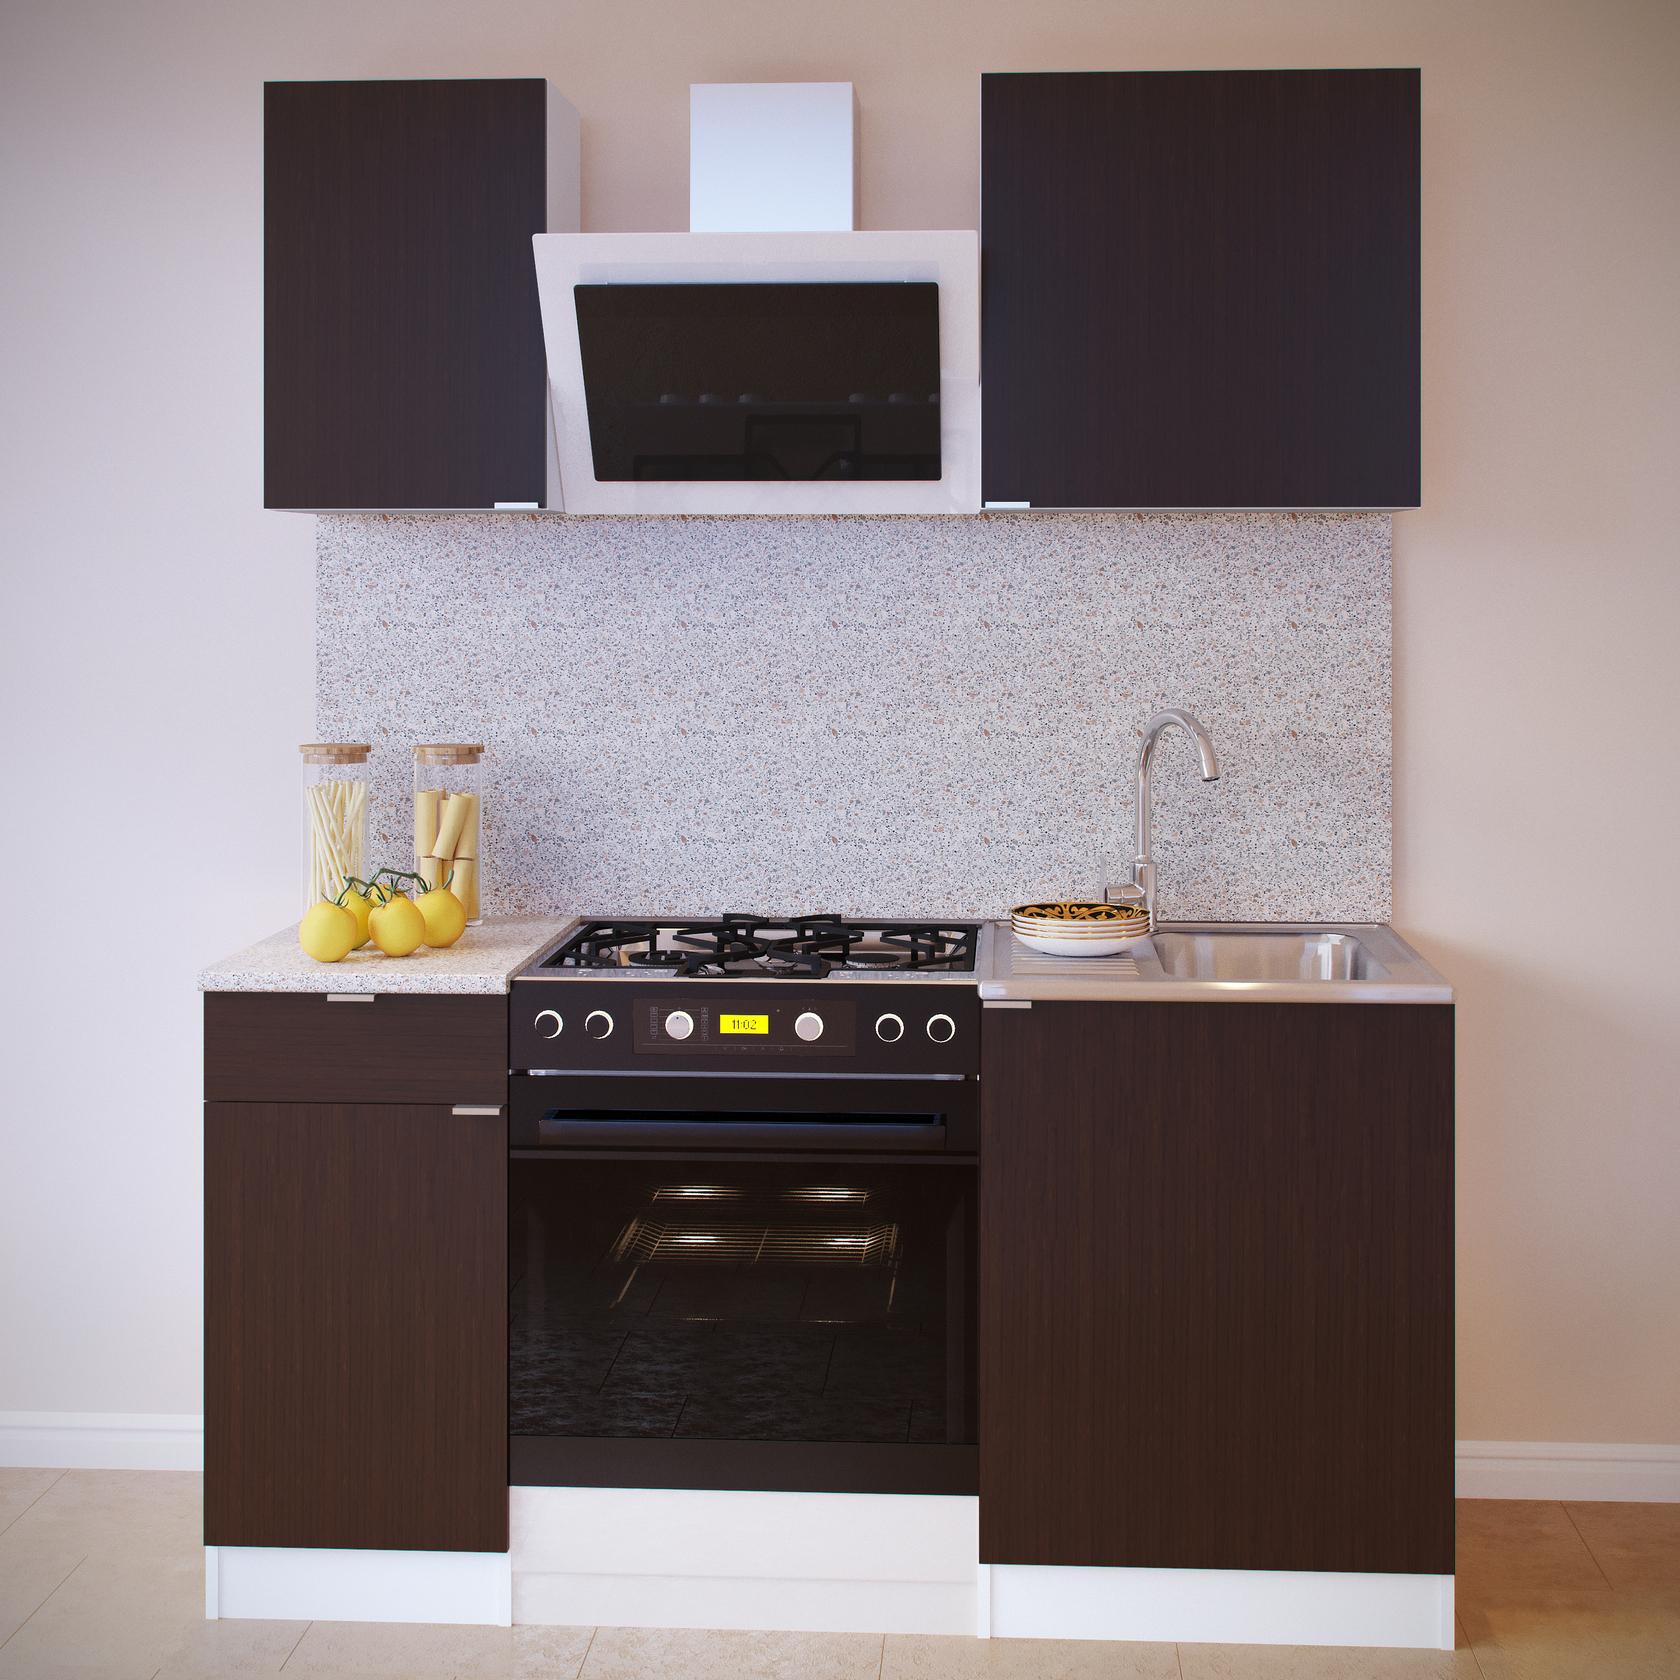 Кухонный гарнитур  ПН-04+ТК-04.1+ПН-06+ТК-06м Белый / Венге